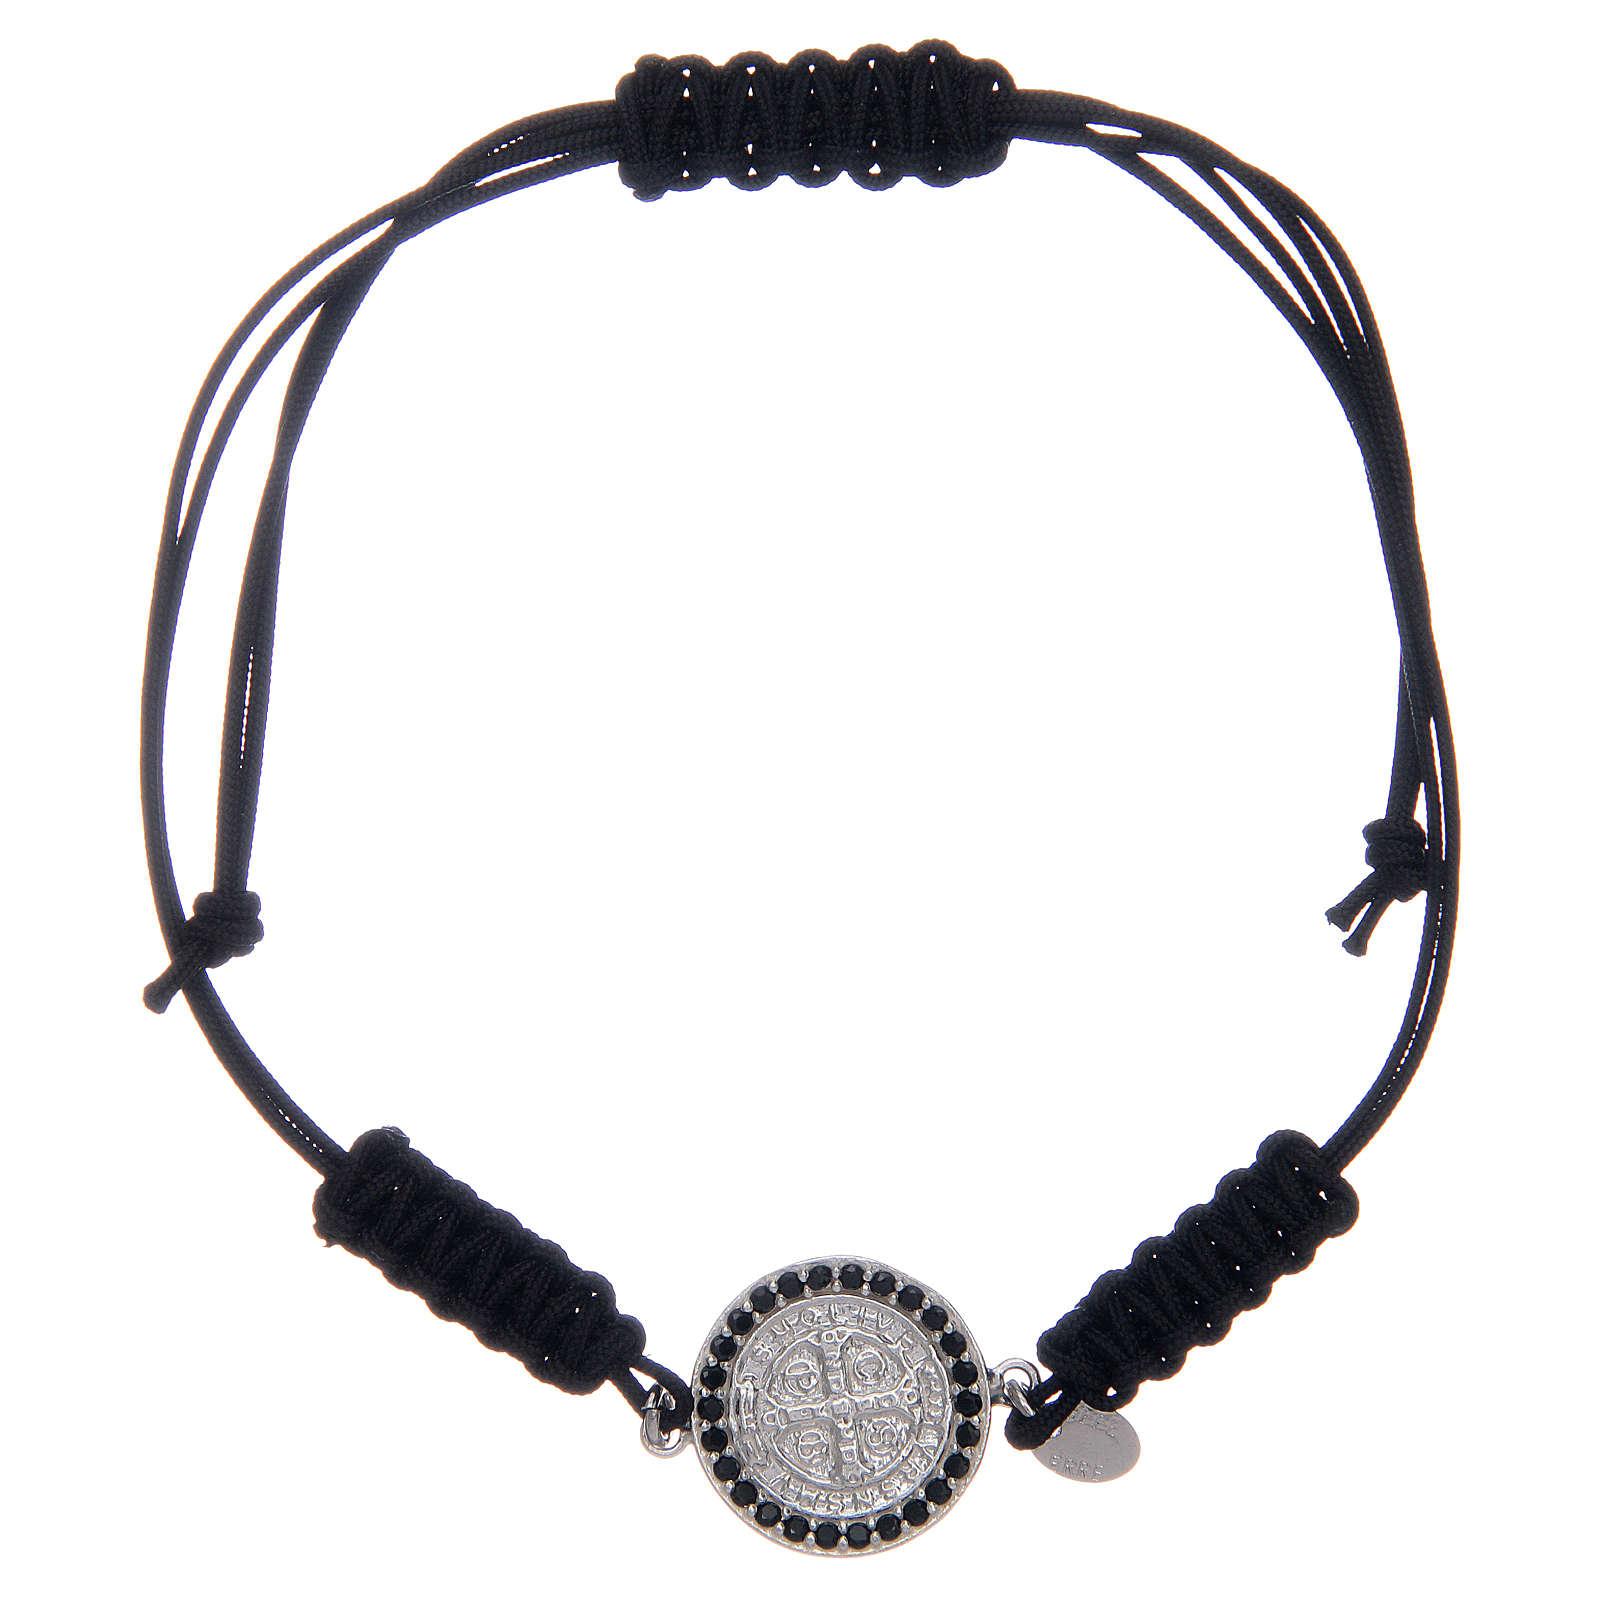 Bracelet in sterling silver Saint Benedict medal with black zircons 4